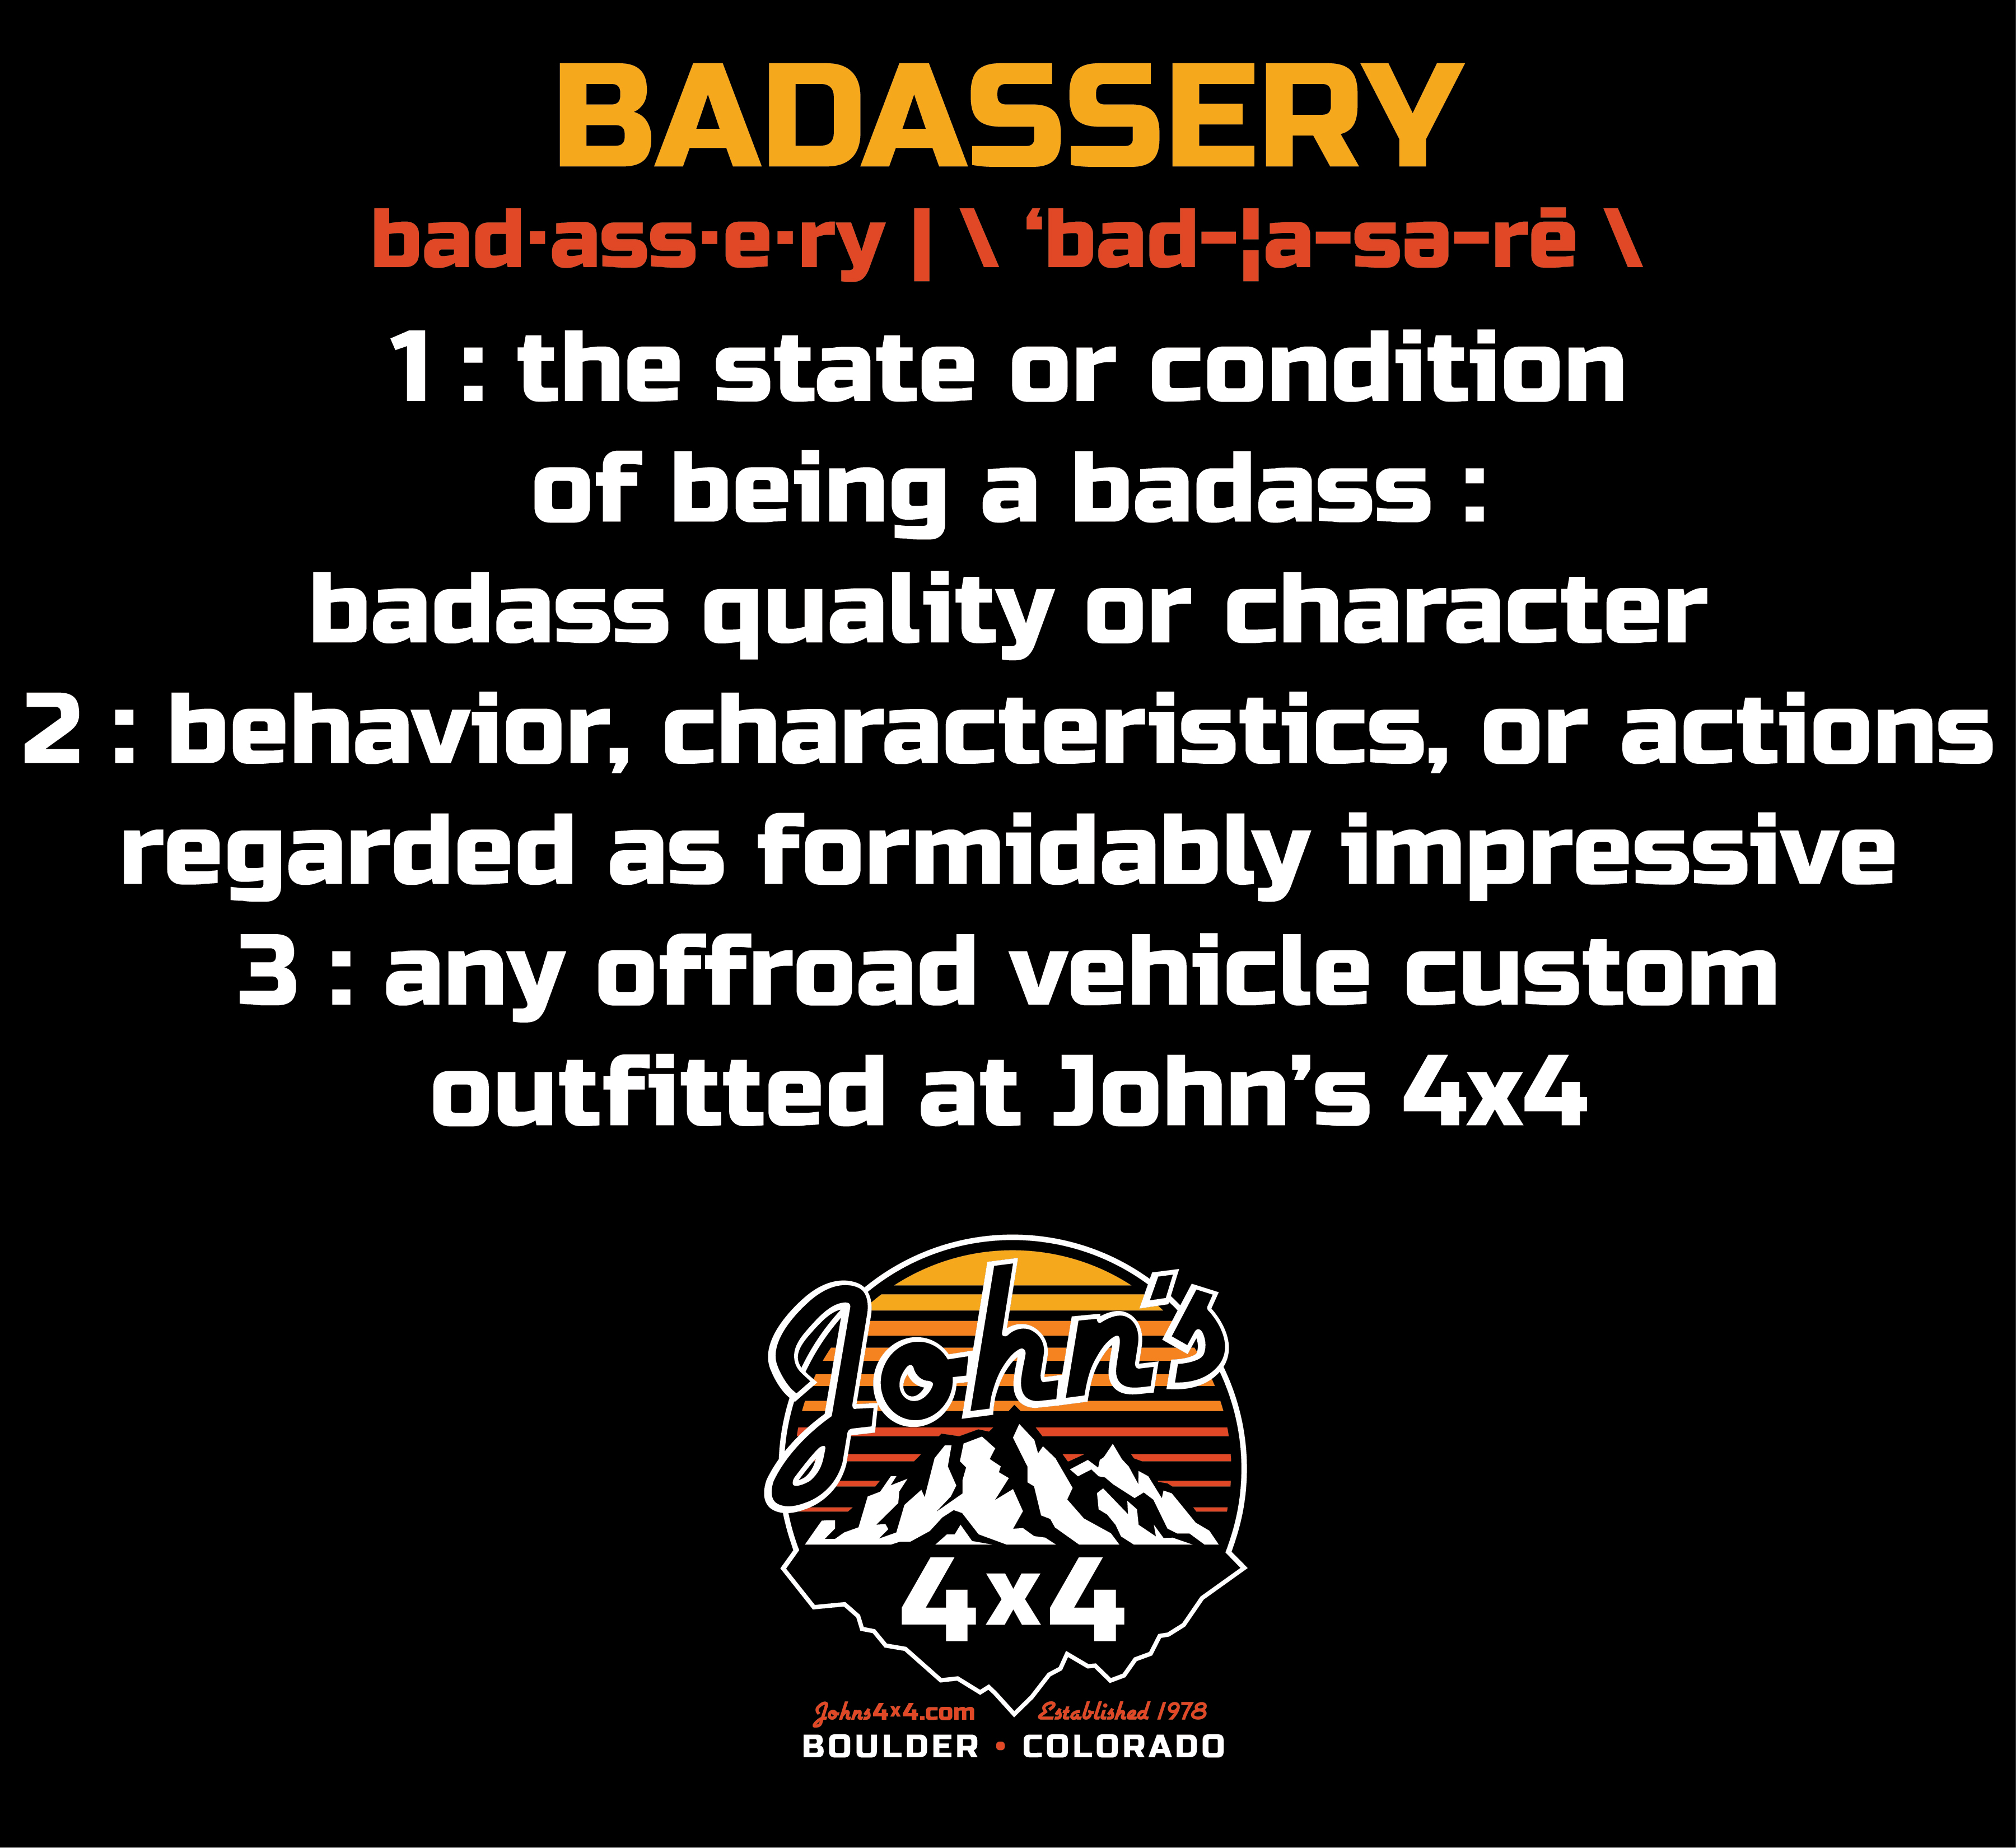 John's 4x4 Center BBB Business Review